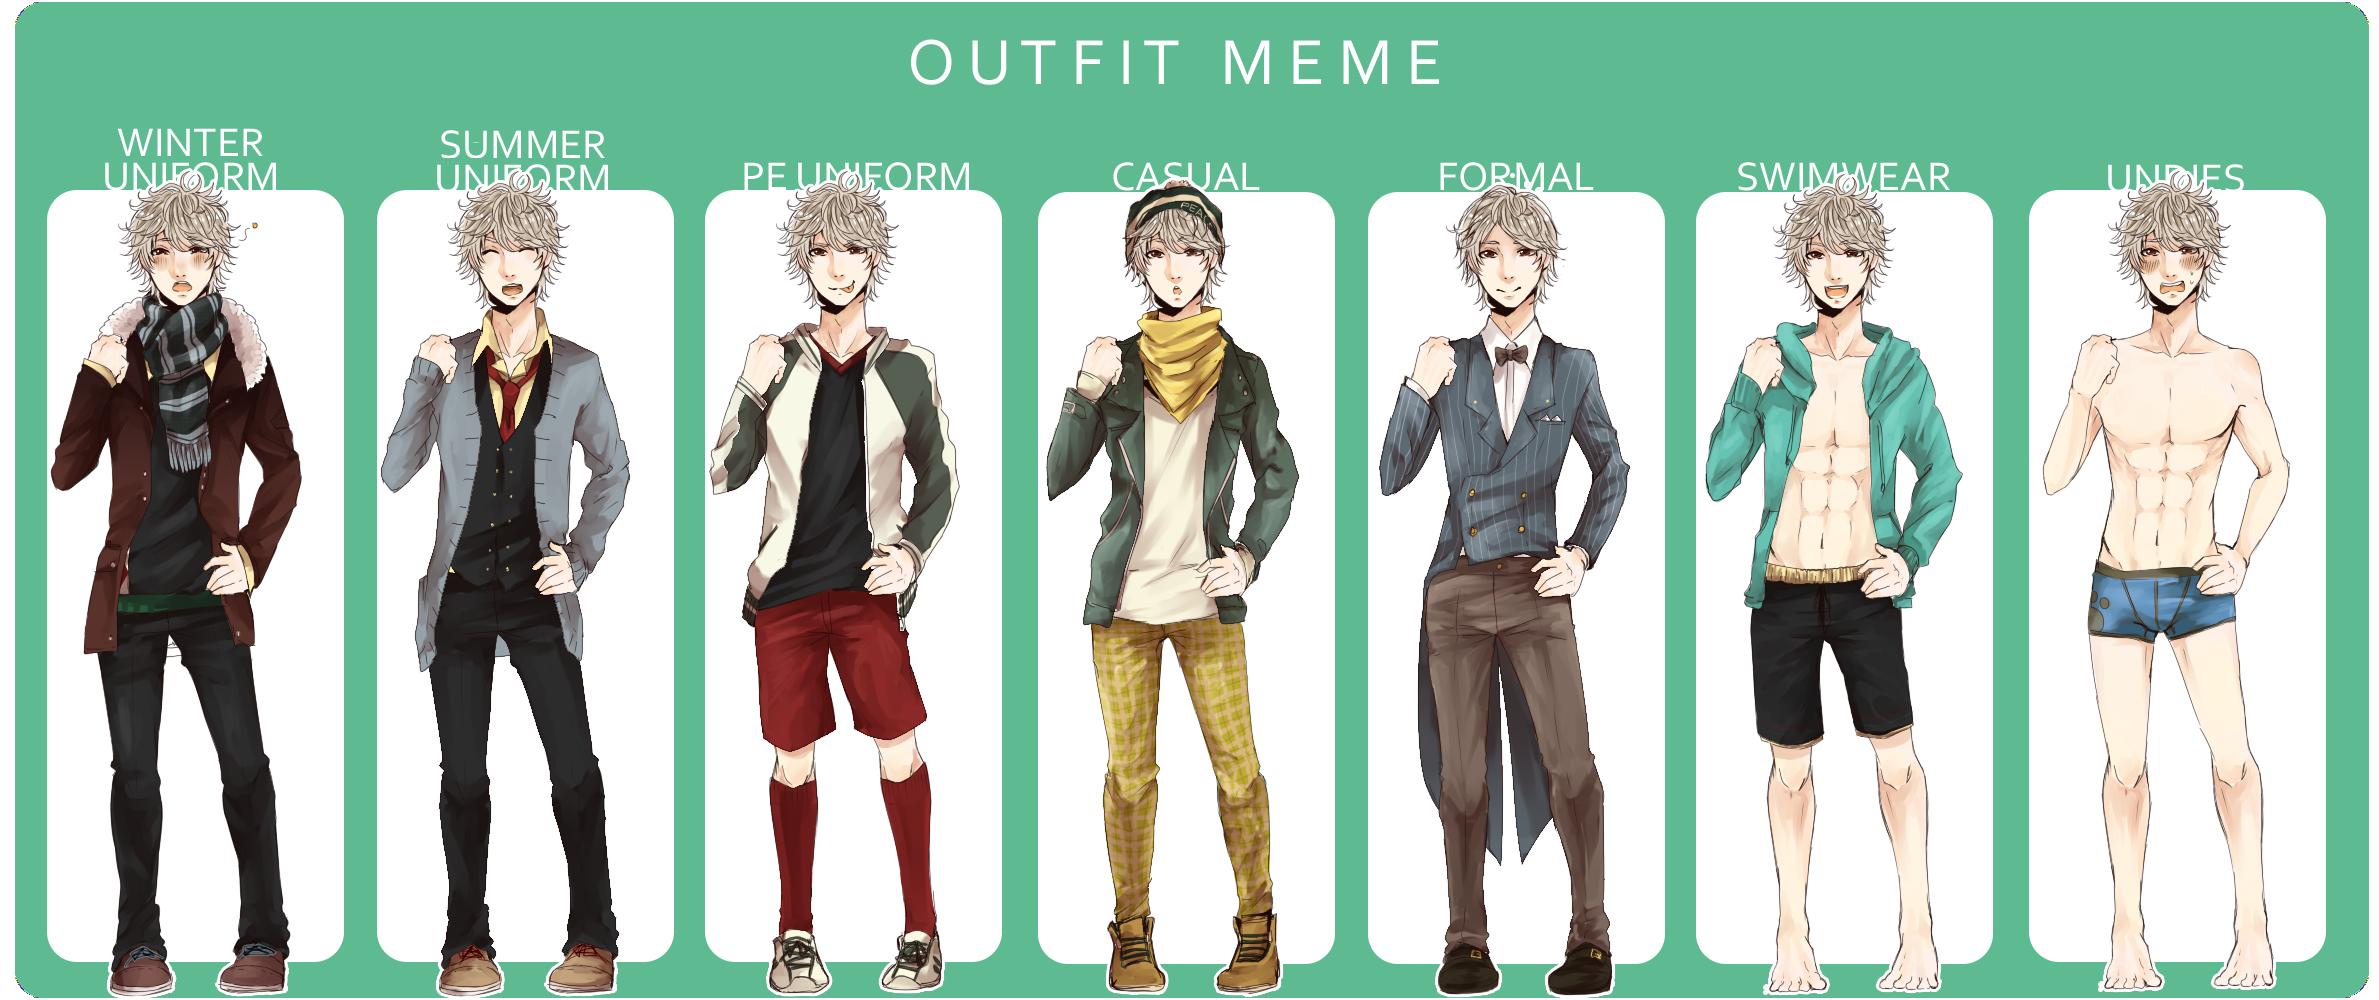 Outfit Meme